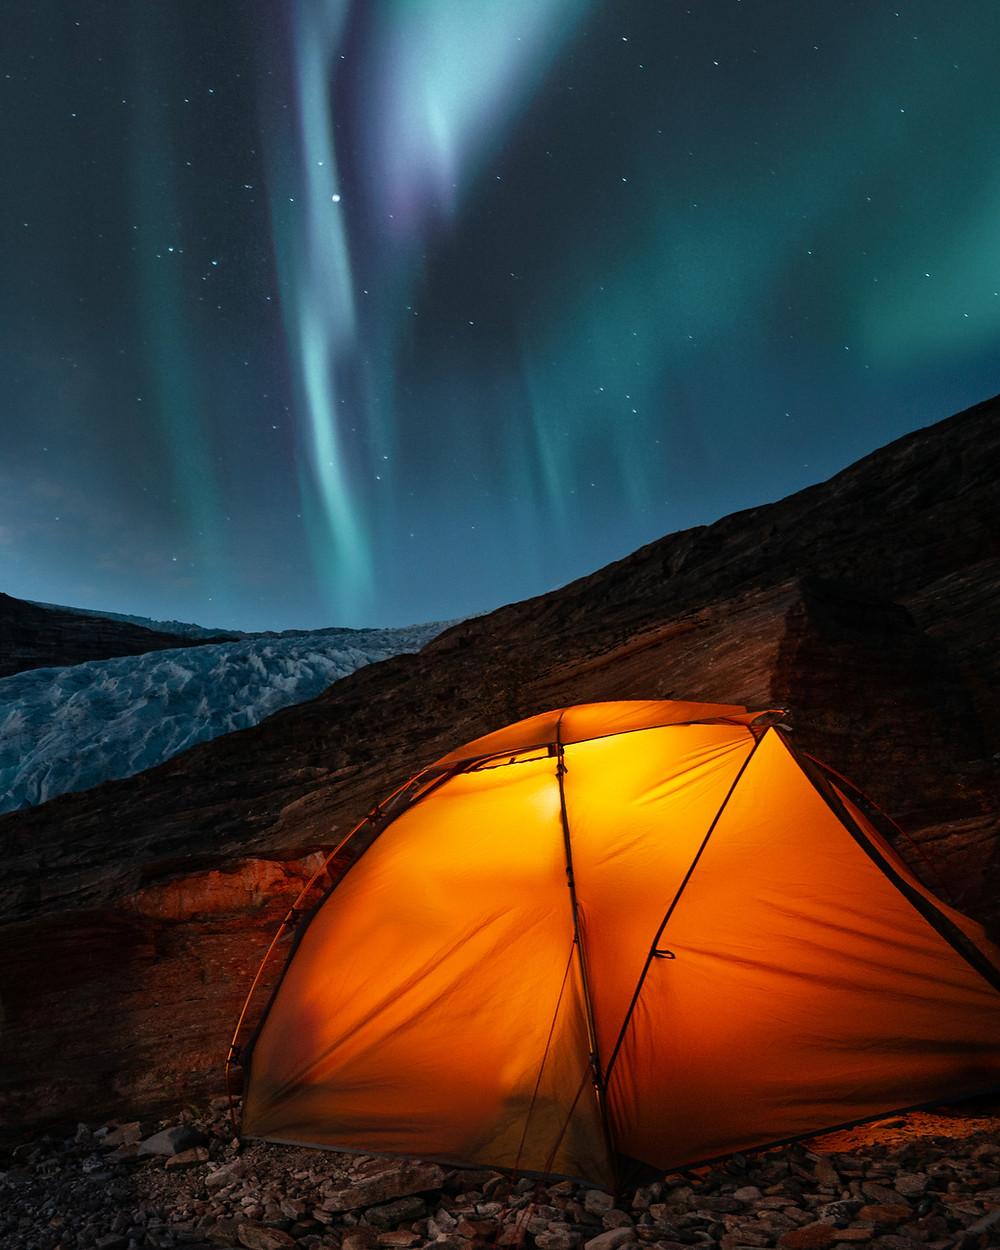 A starlit black night sky with glowing wisps of greenish white light streak across the sky above a glowing tent in a night dark, wilderness landscape.